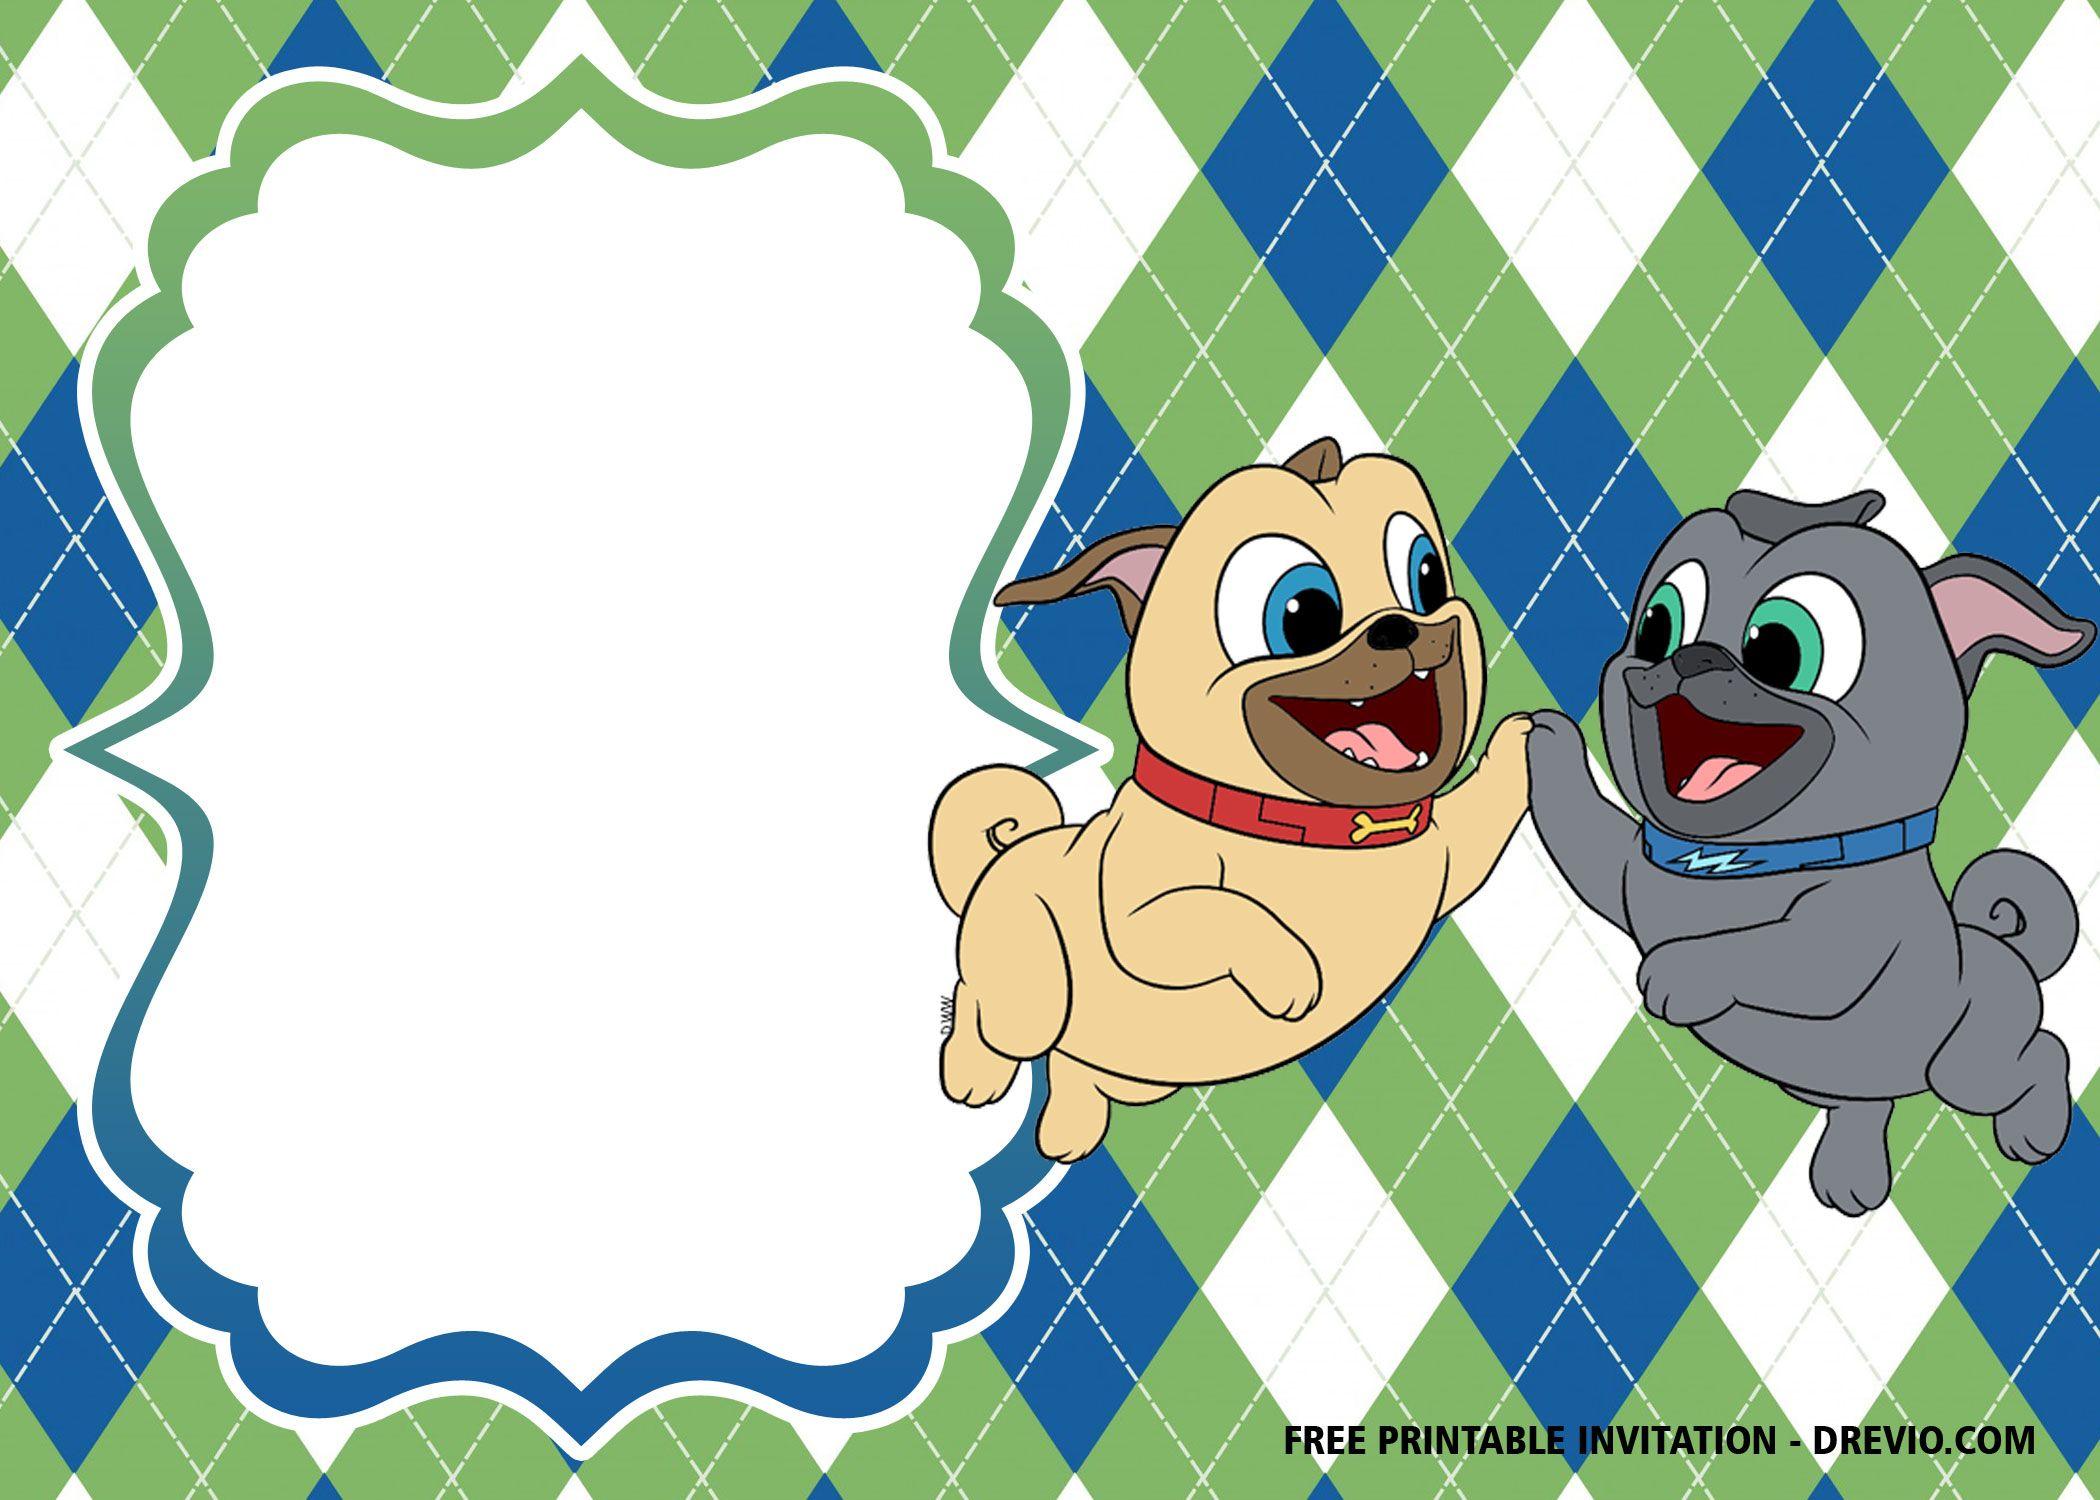 Free Disney Puppy Dog Pals Invitation Templates Free Printable Baby Shower Invitations Printable Baby Shower Invitations Free Printable Birthday Invitations